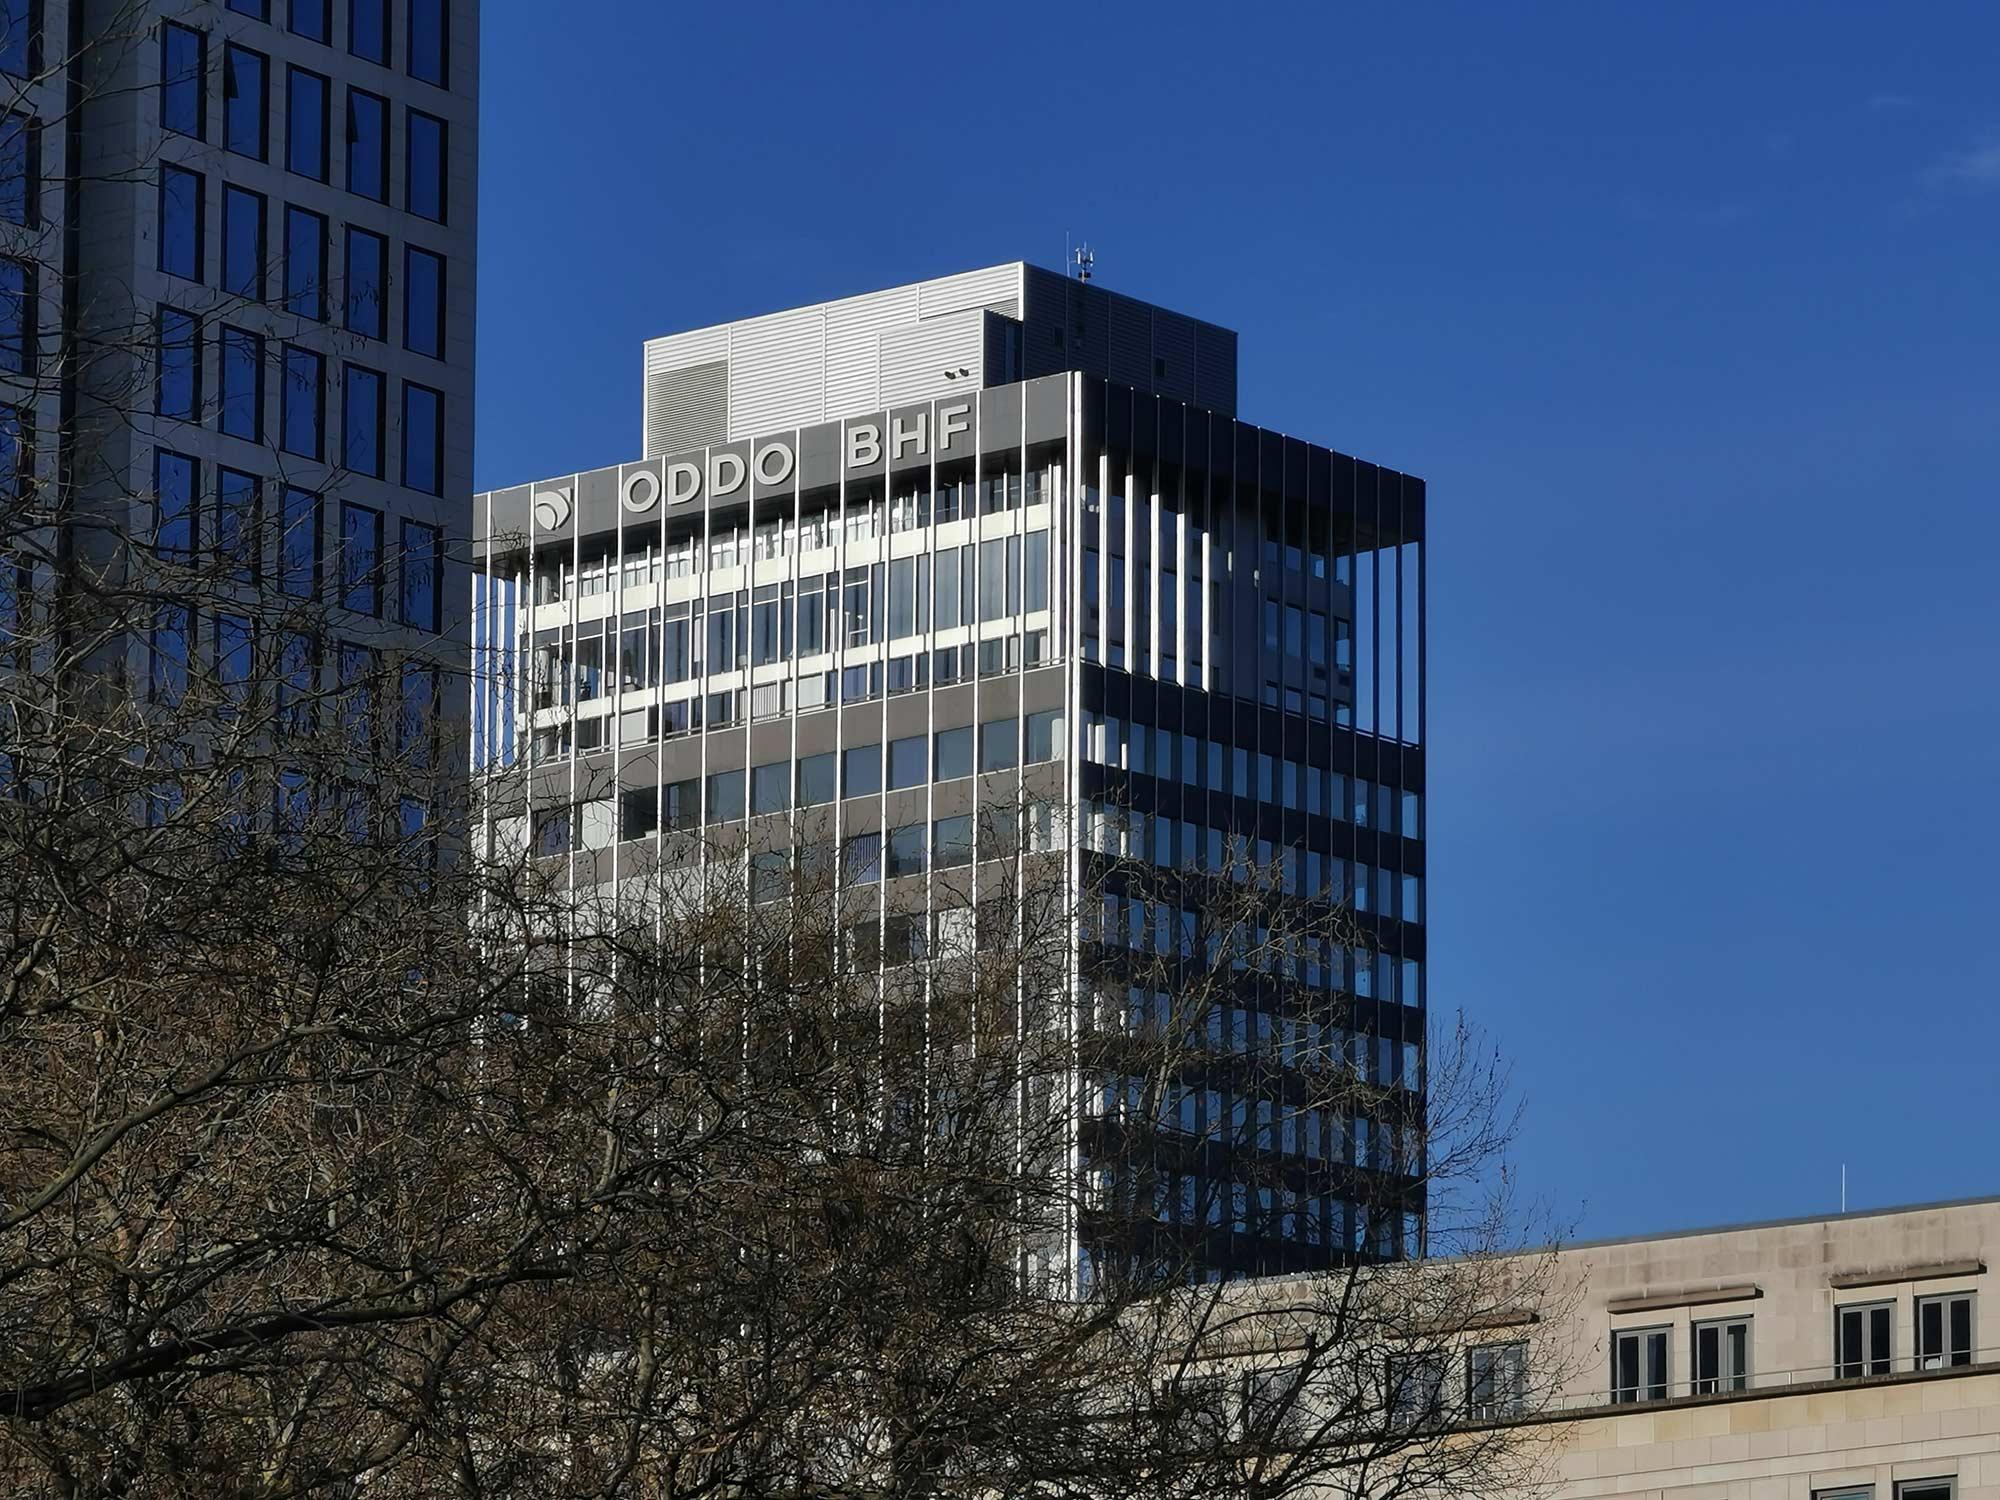 ODDO BHF Tower Frankfurt - BHF Bank Turmkopf